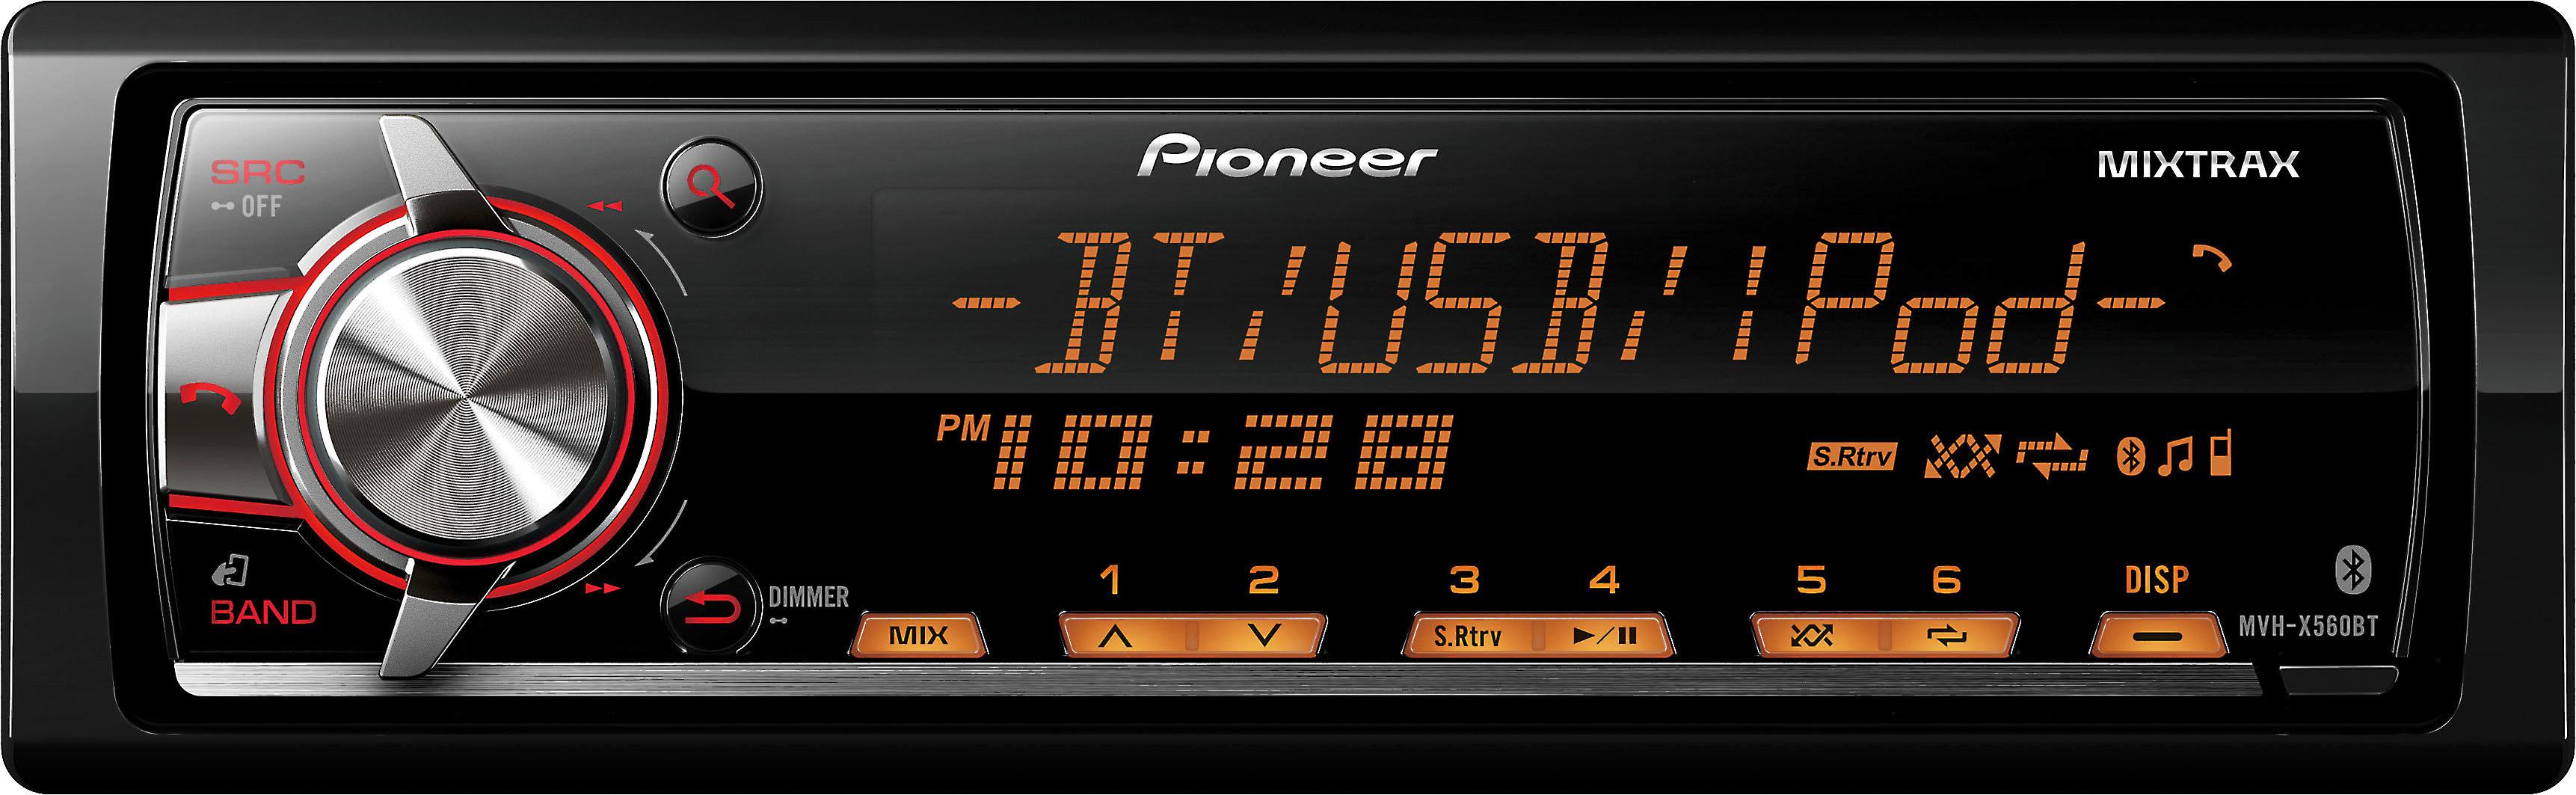 Wiring Mvh Car Pioneer Diagram Stereo X560bt - exclusive ... on